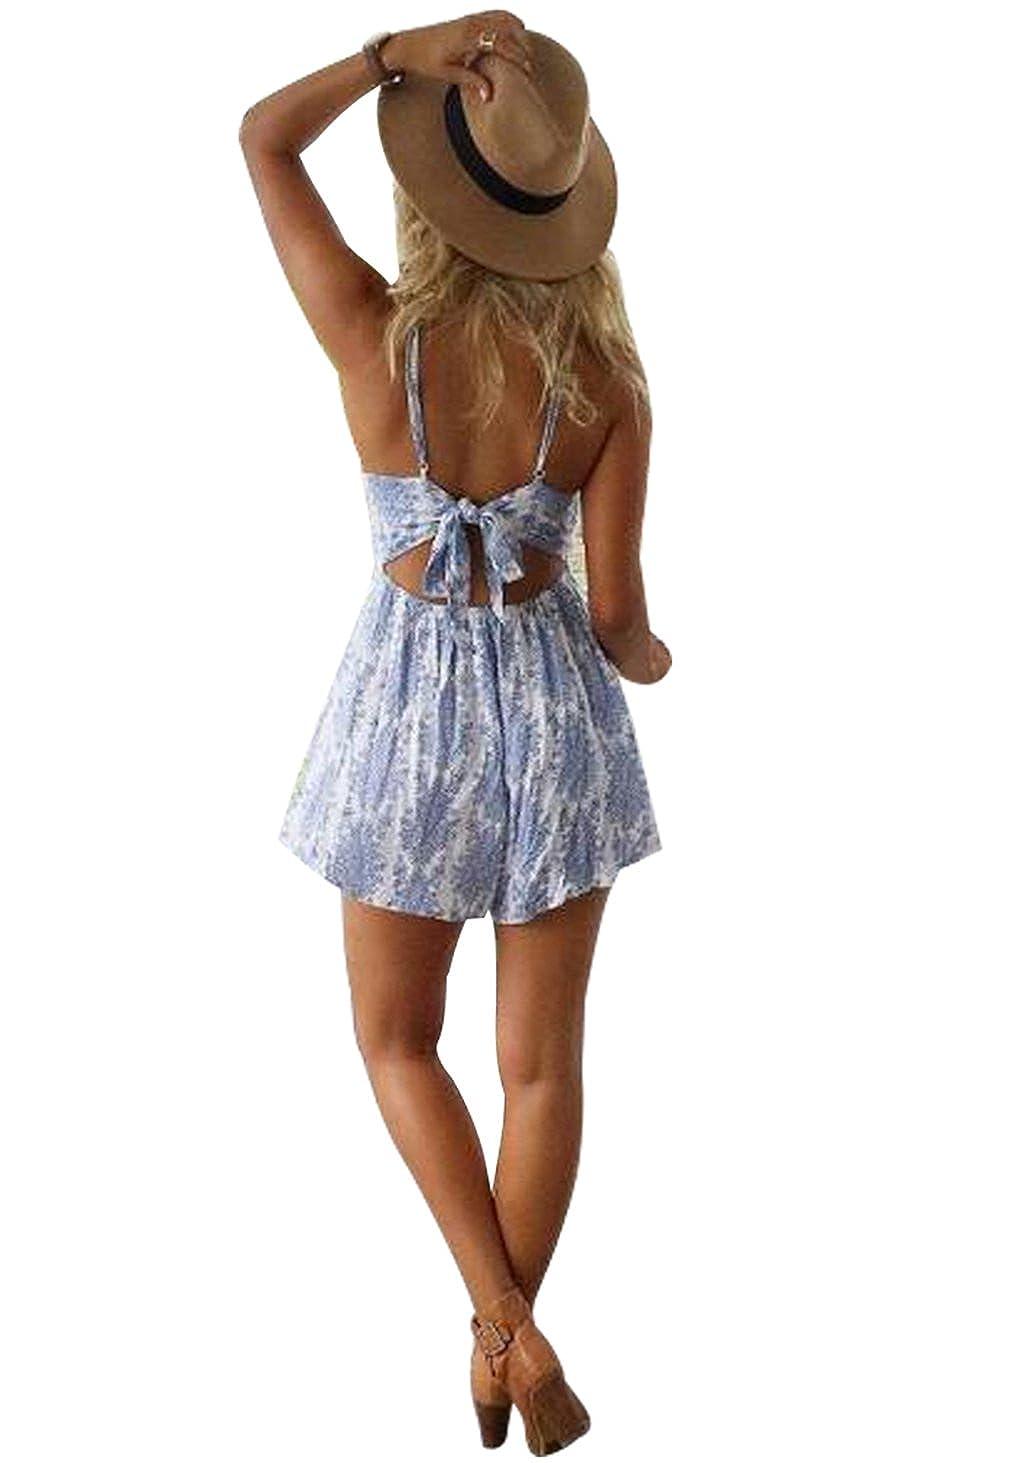 Maximgr Womens Sleeveless Bohemian Backless Romper Short I Am Cotton Blue Sea Summer Beach Jumpsuit Clothing